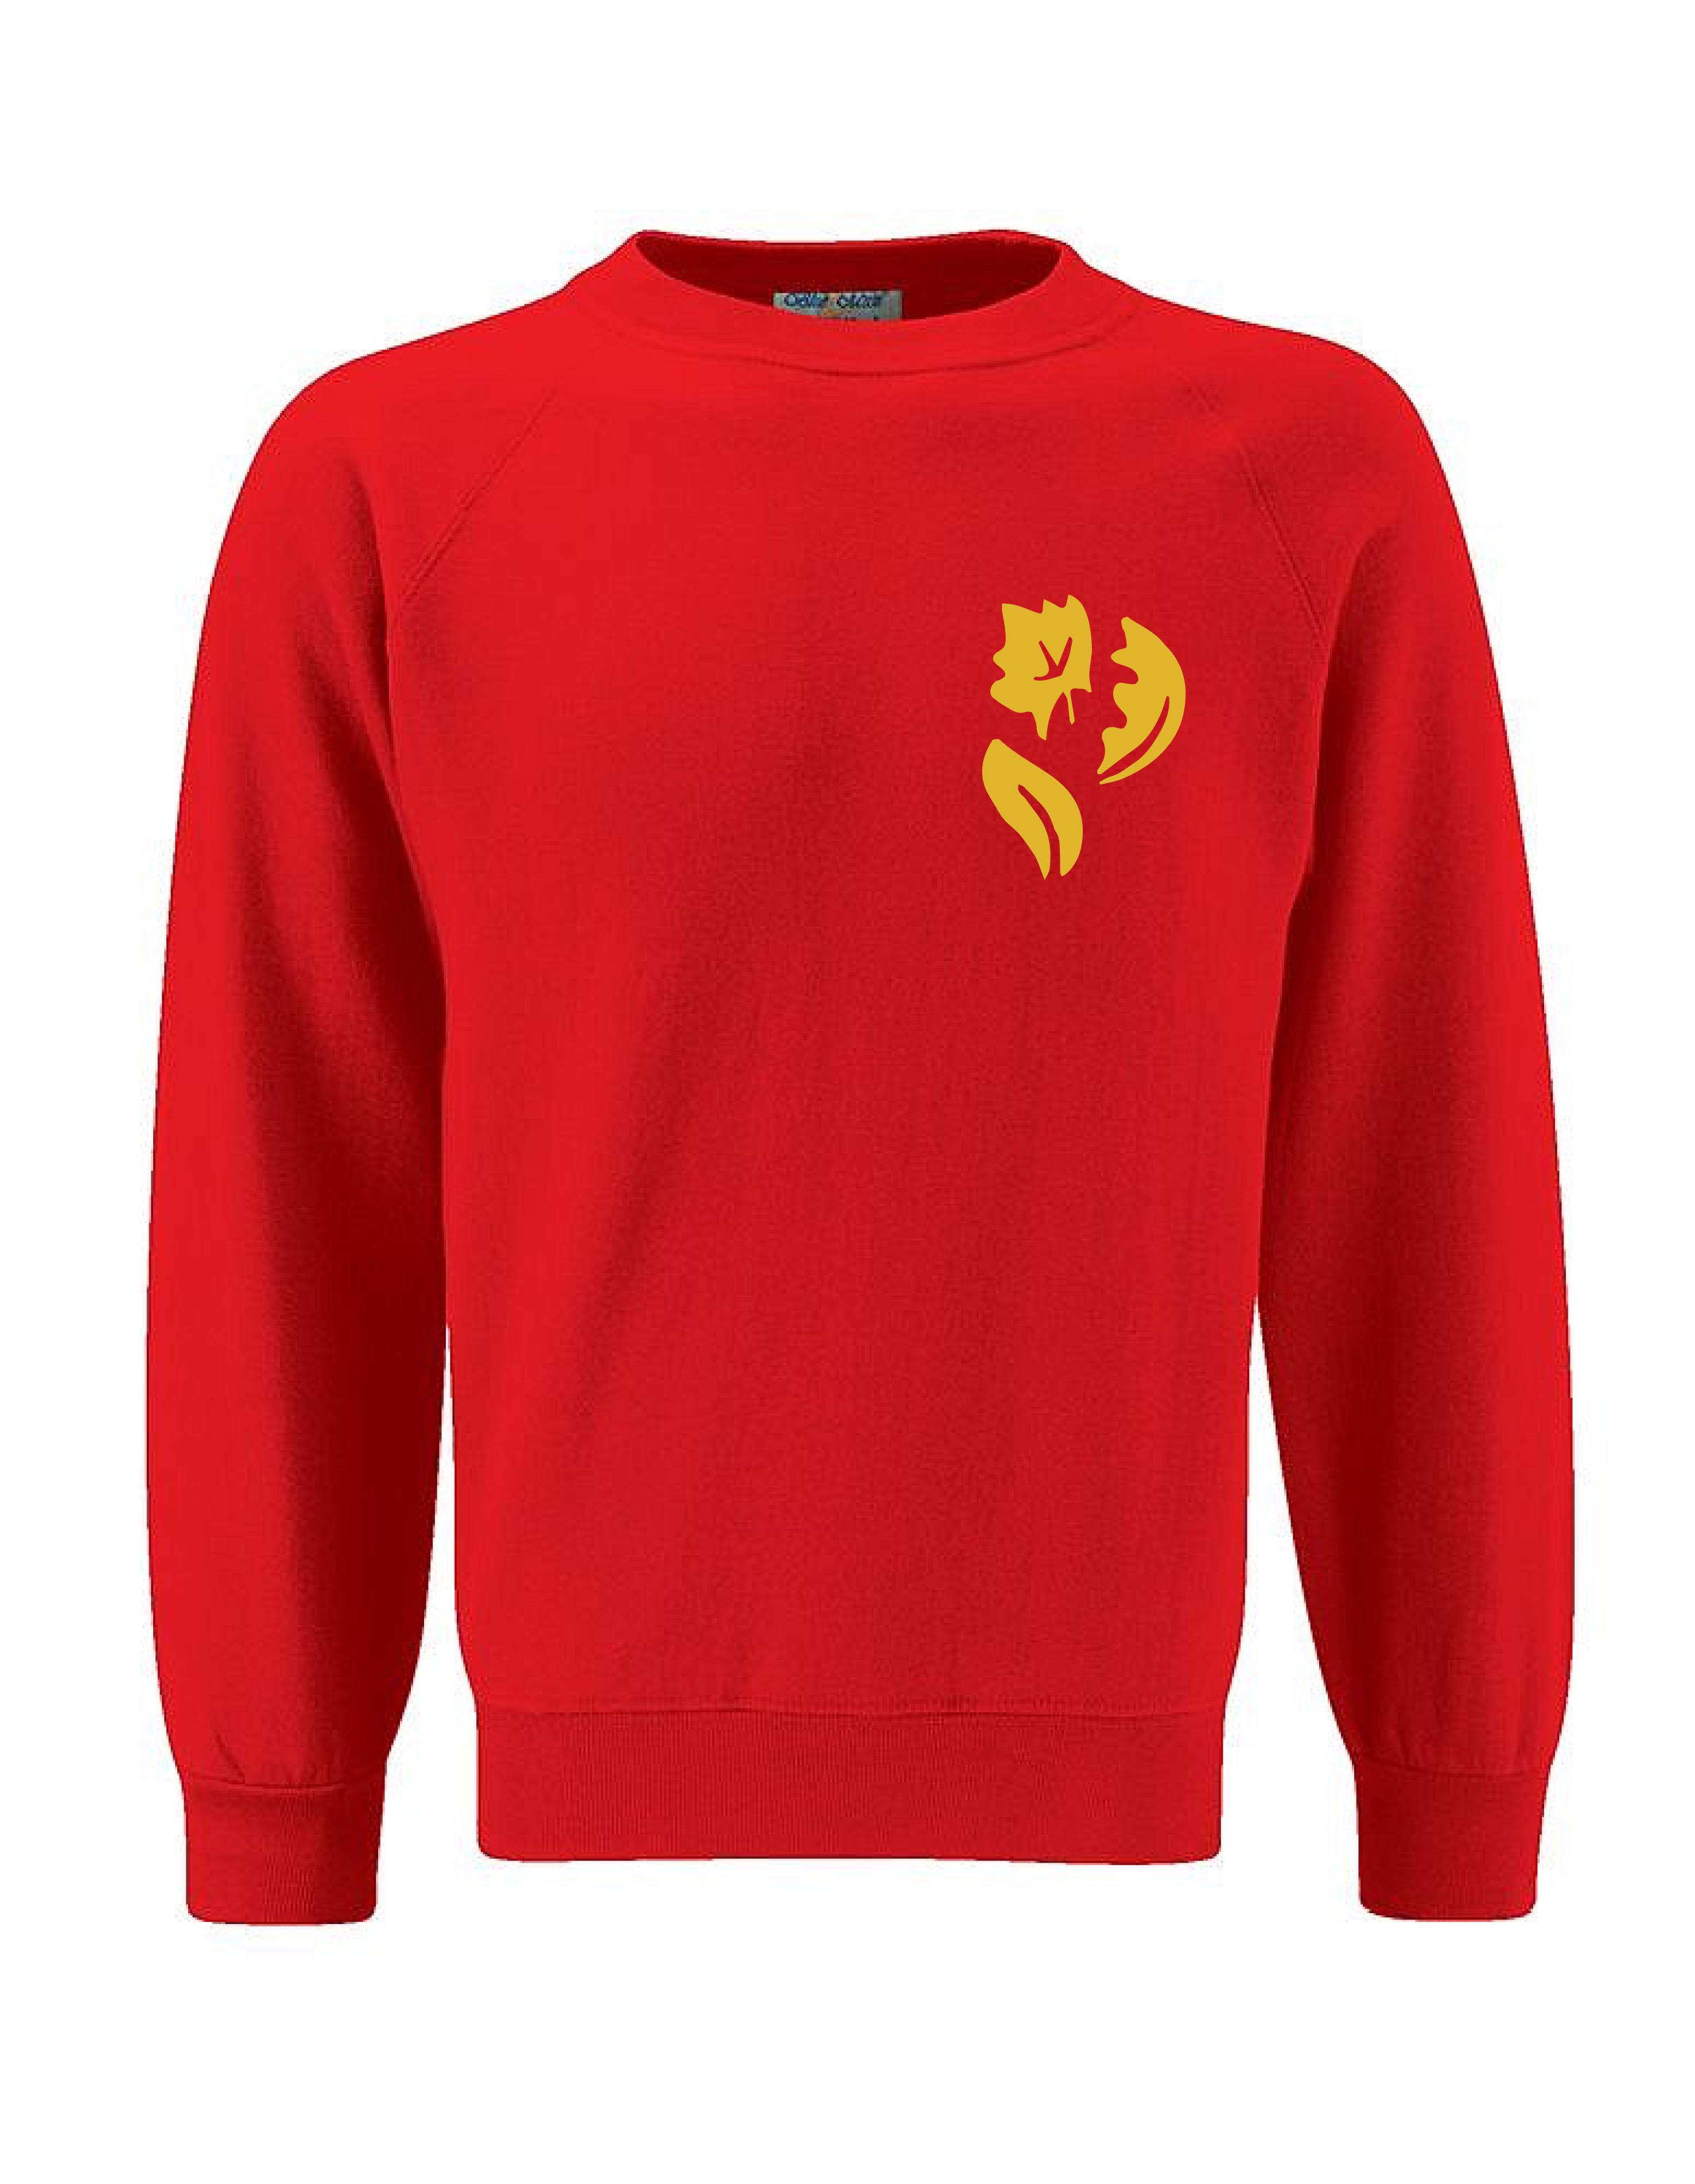 Parkhead Sweatshirt